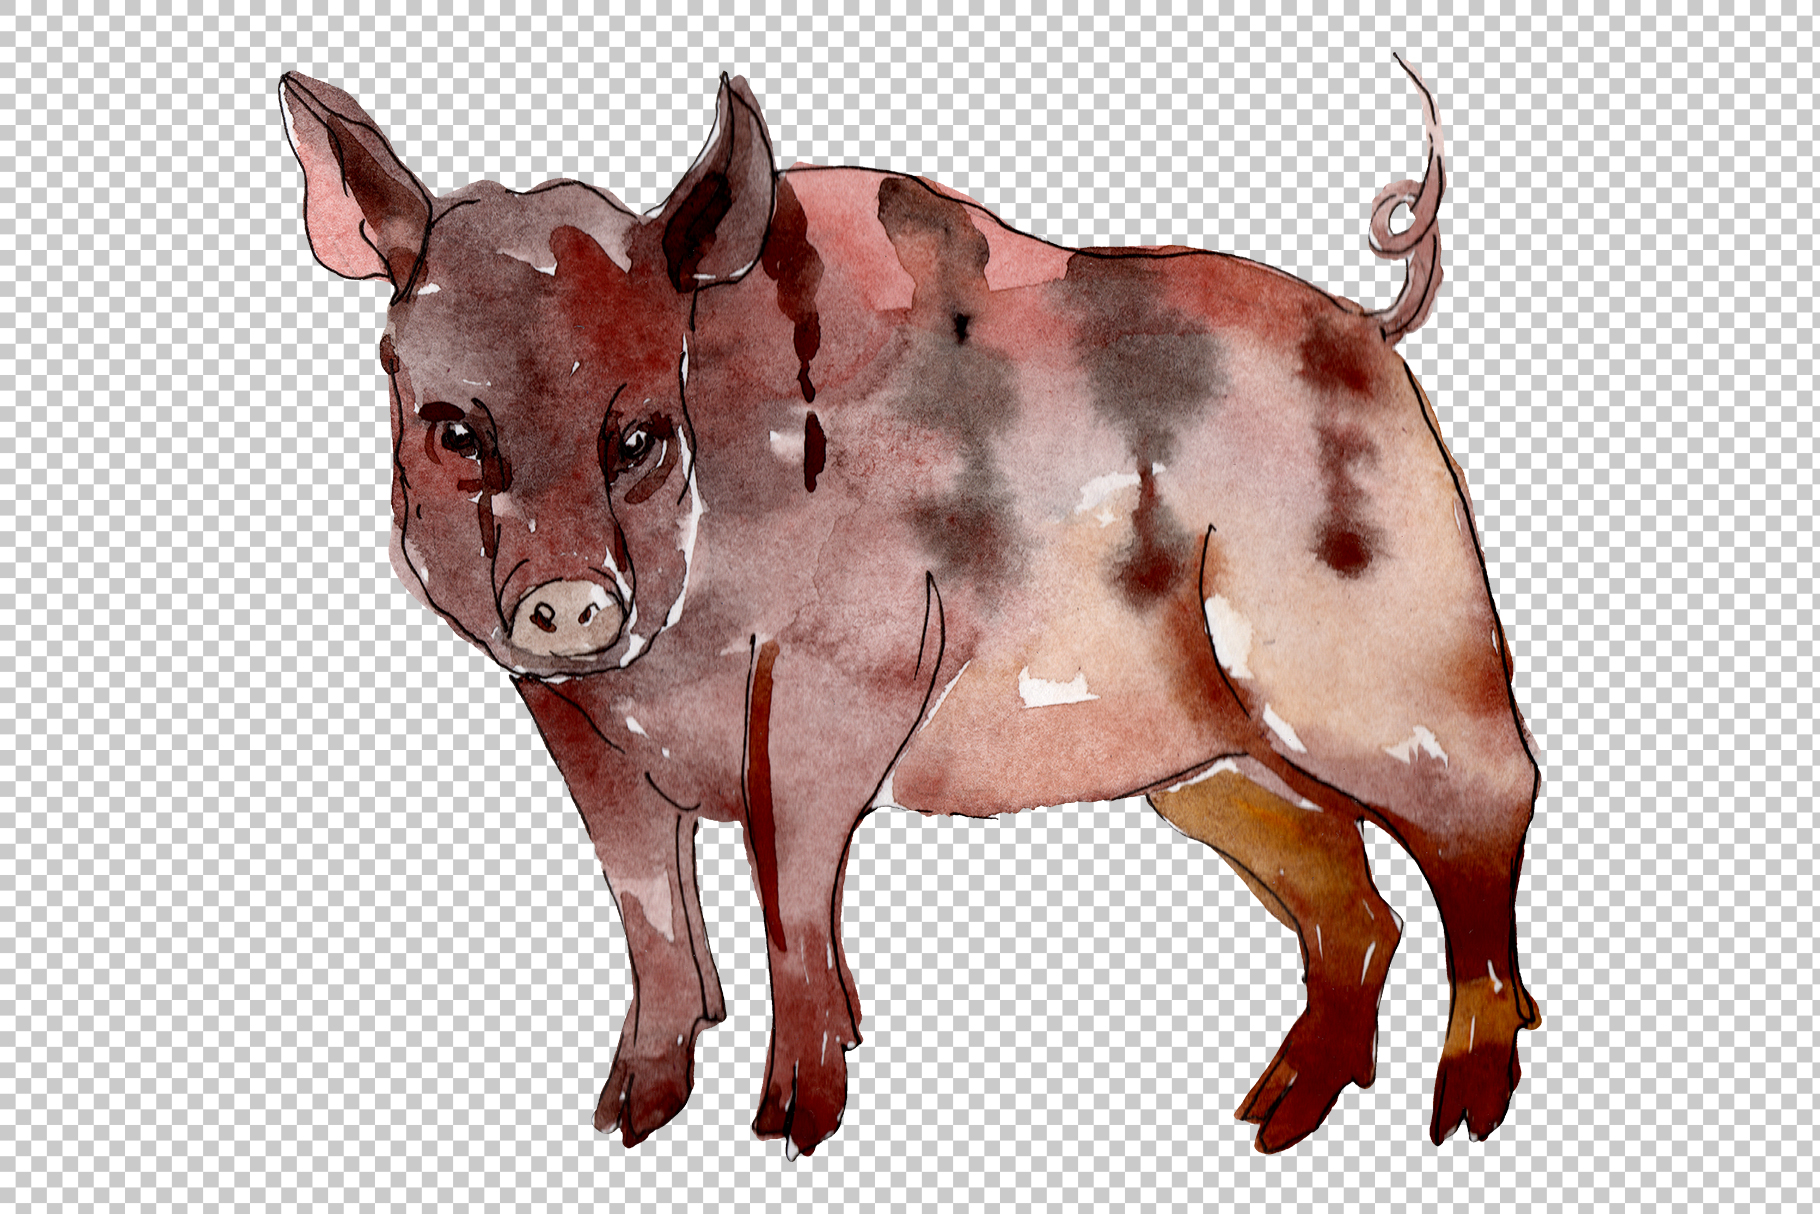 Farm animals pig boar Watercolor png example image 2